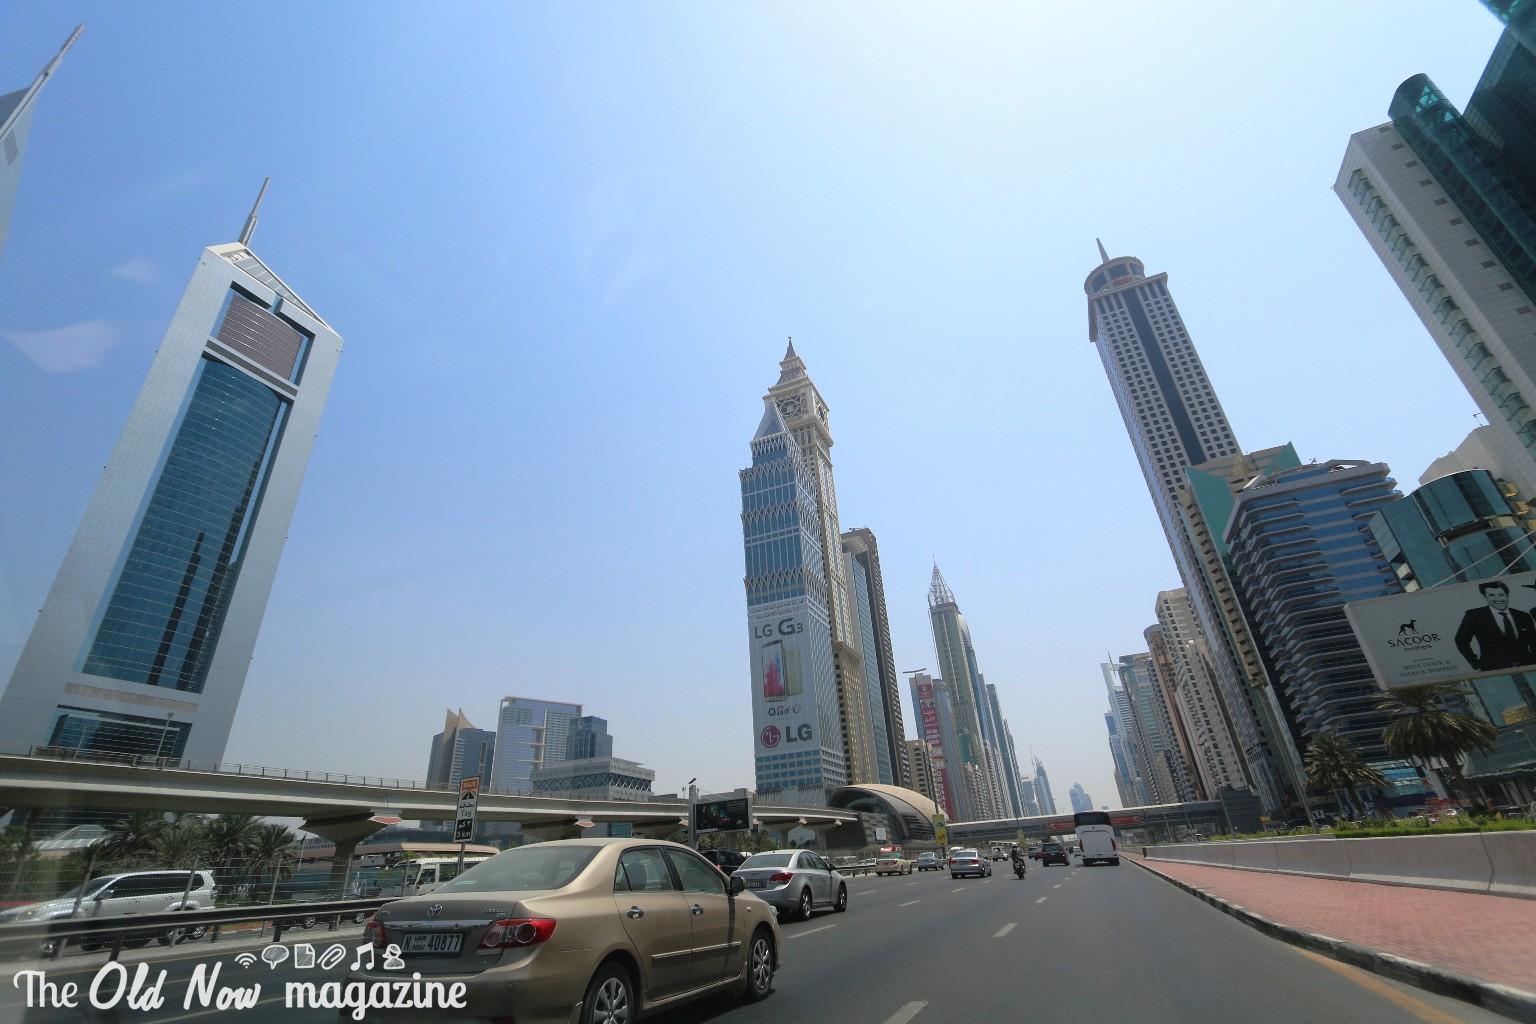 DUBAY DAY1 THEOLDNOW (10)